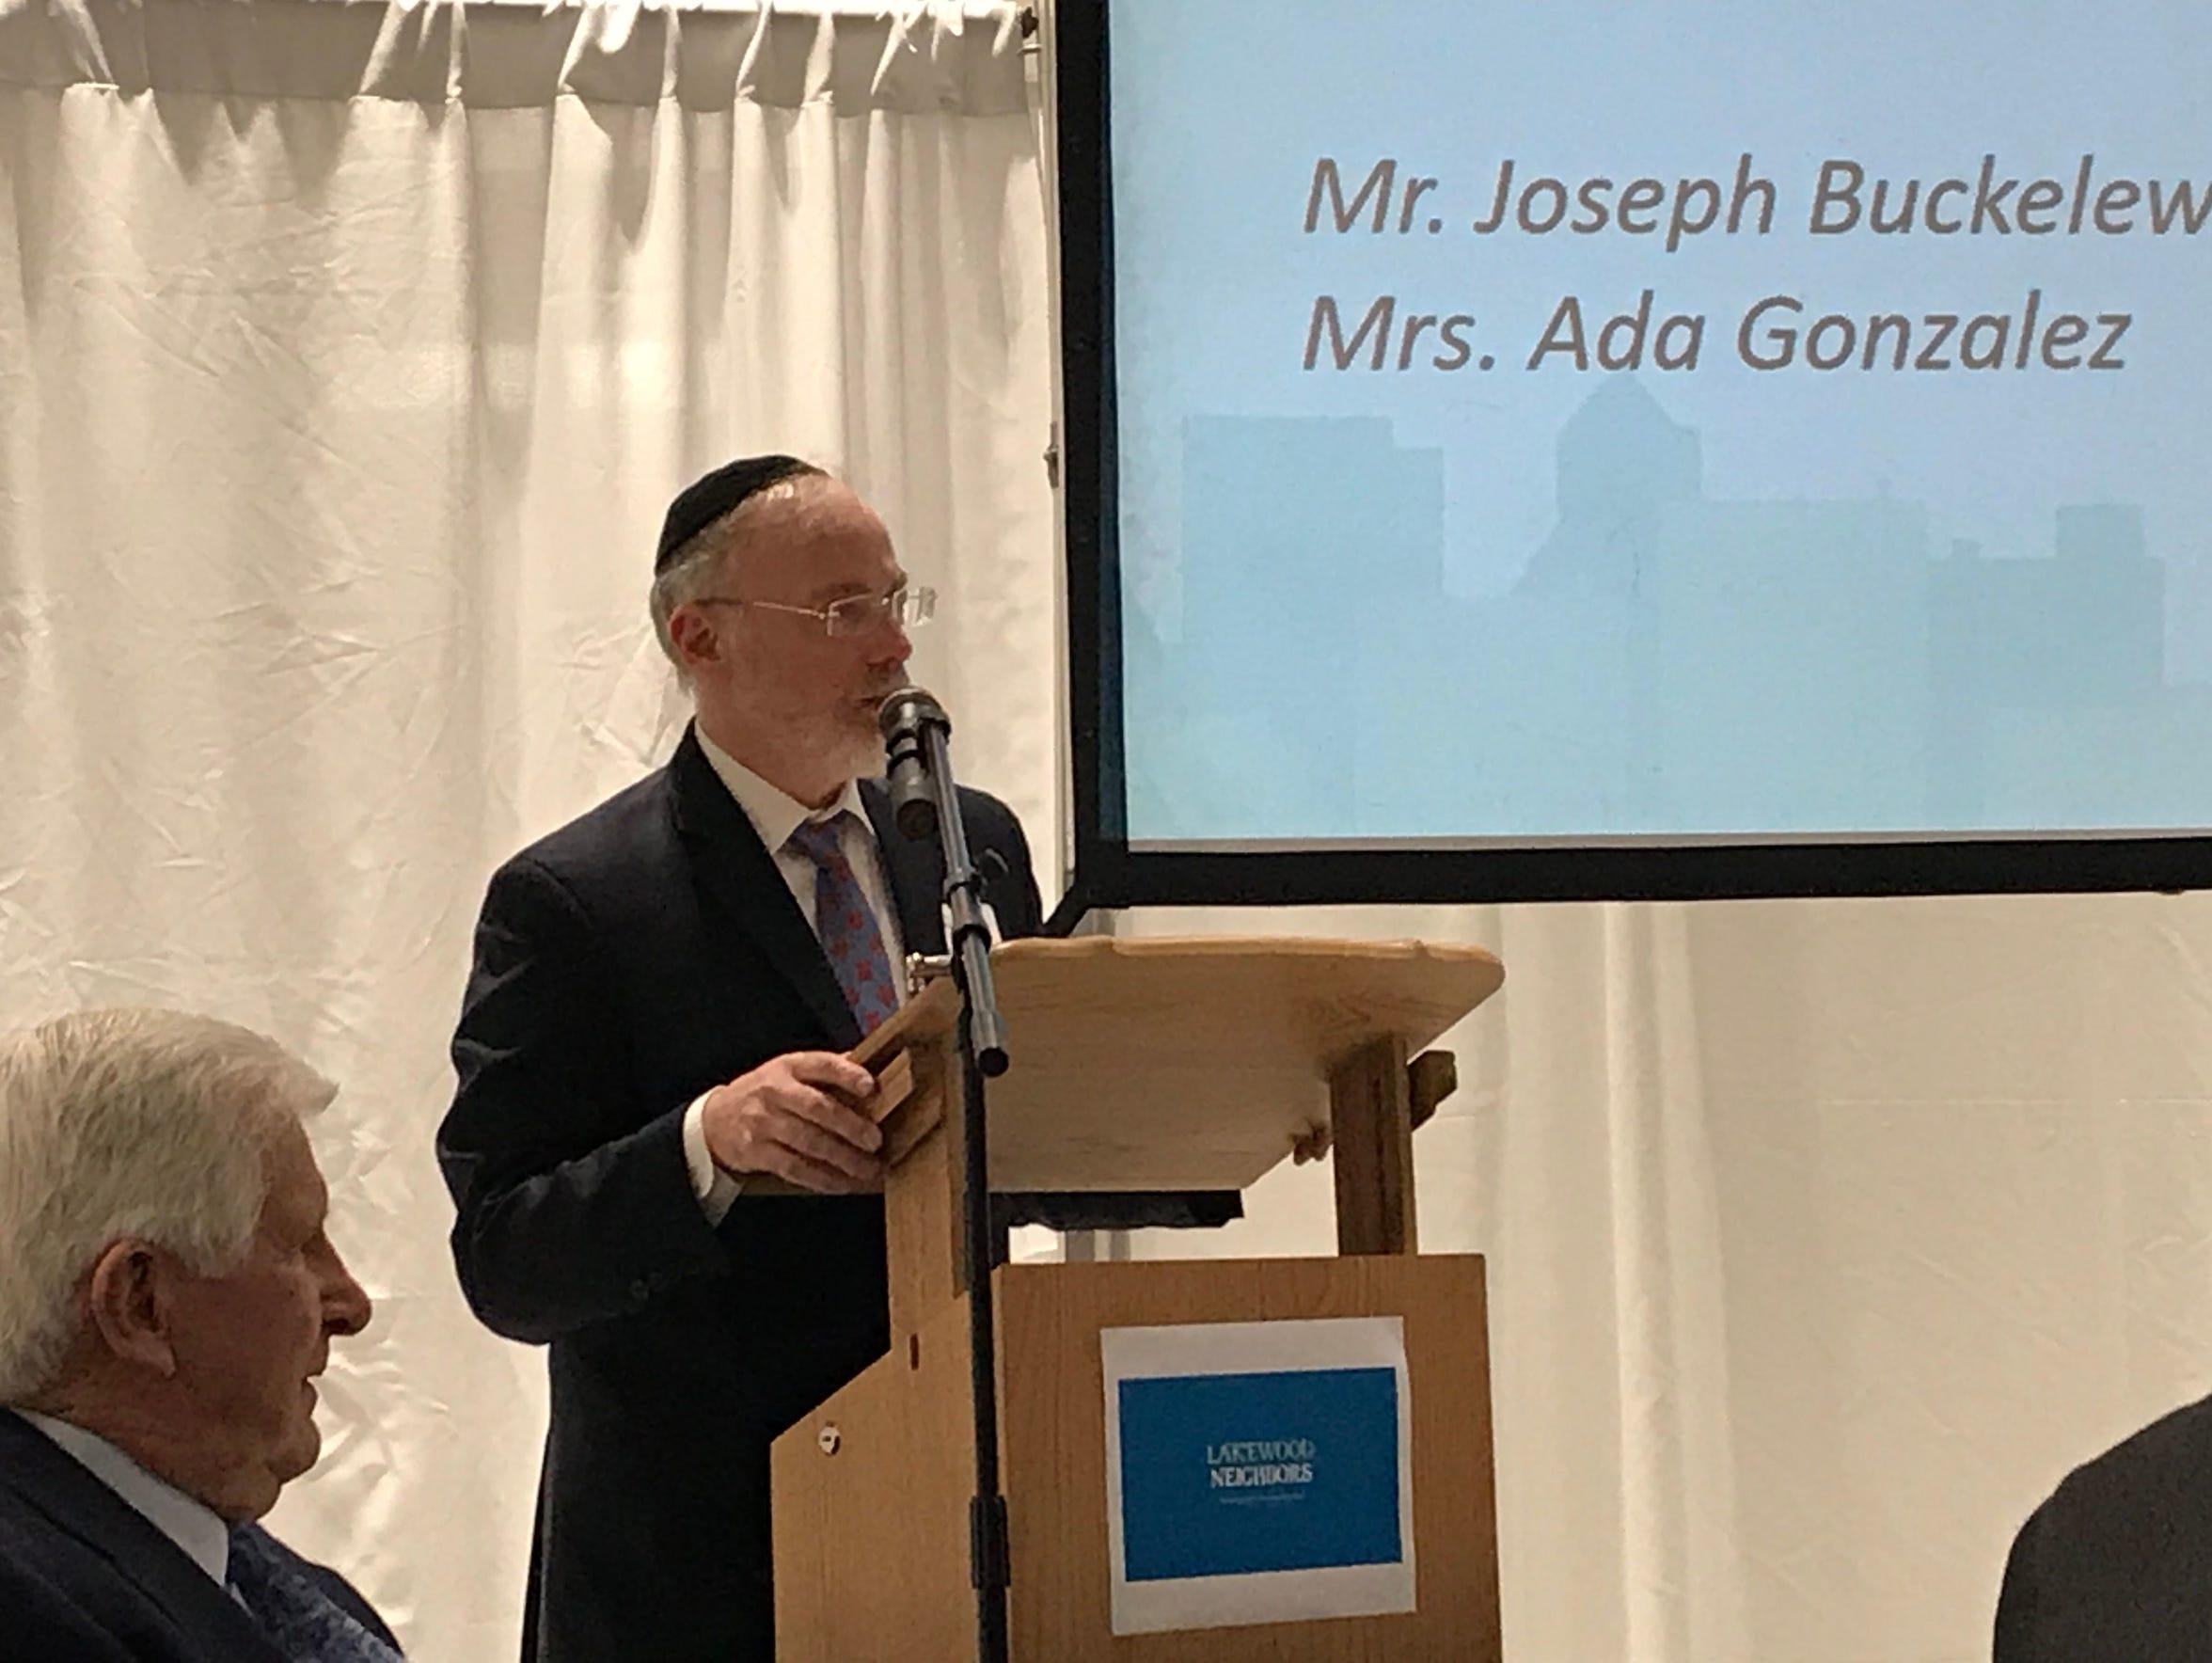 Beth Medrash Govoha yeshiva President Rabbi Aaron Kotler